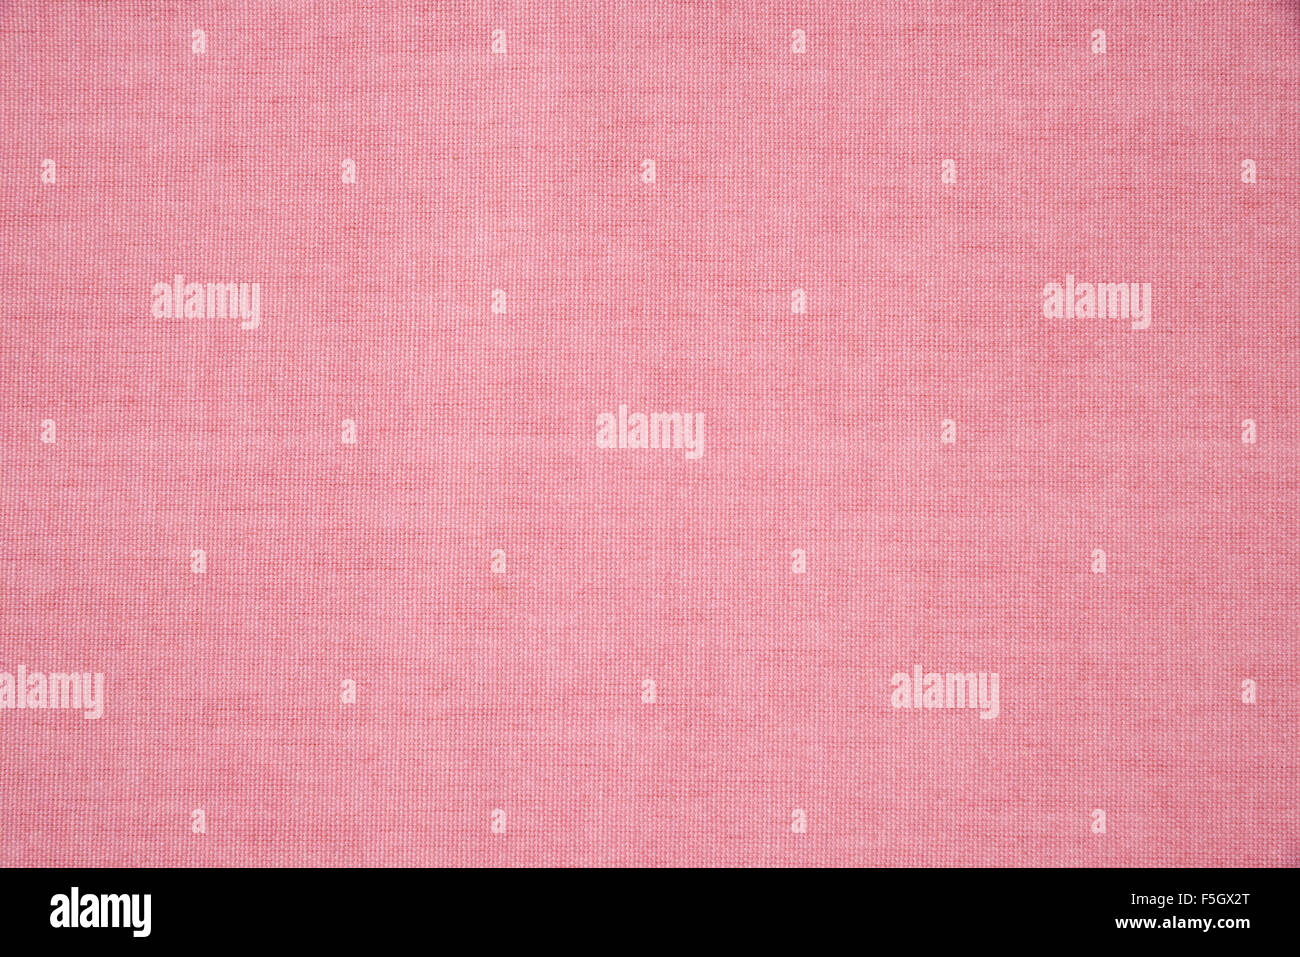 Detalle de rosa alfombrilla fondos Imagen De Stock